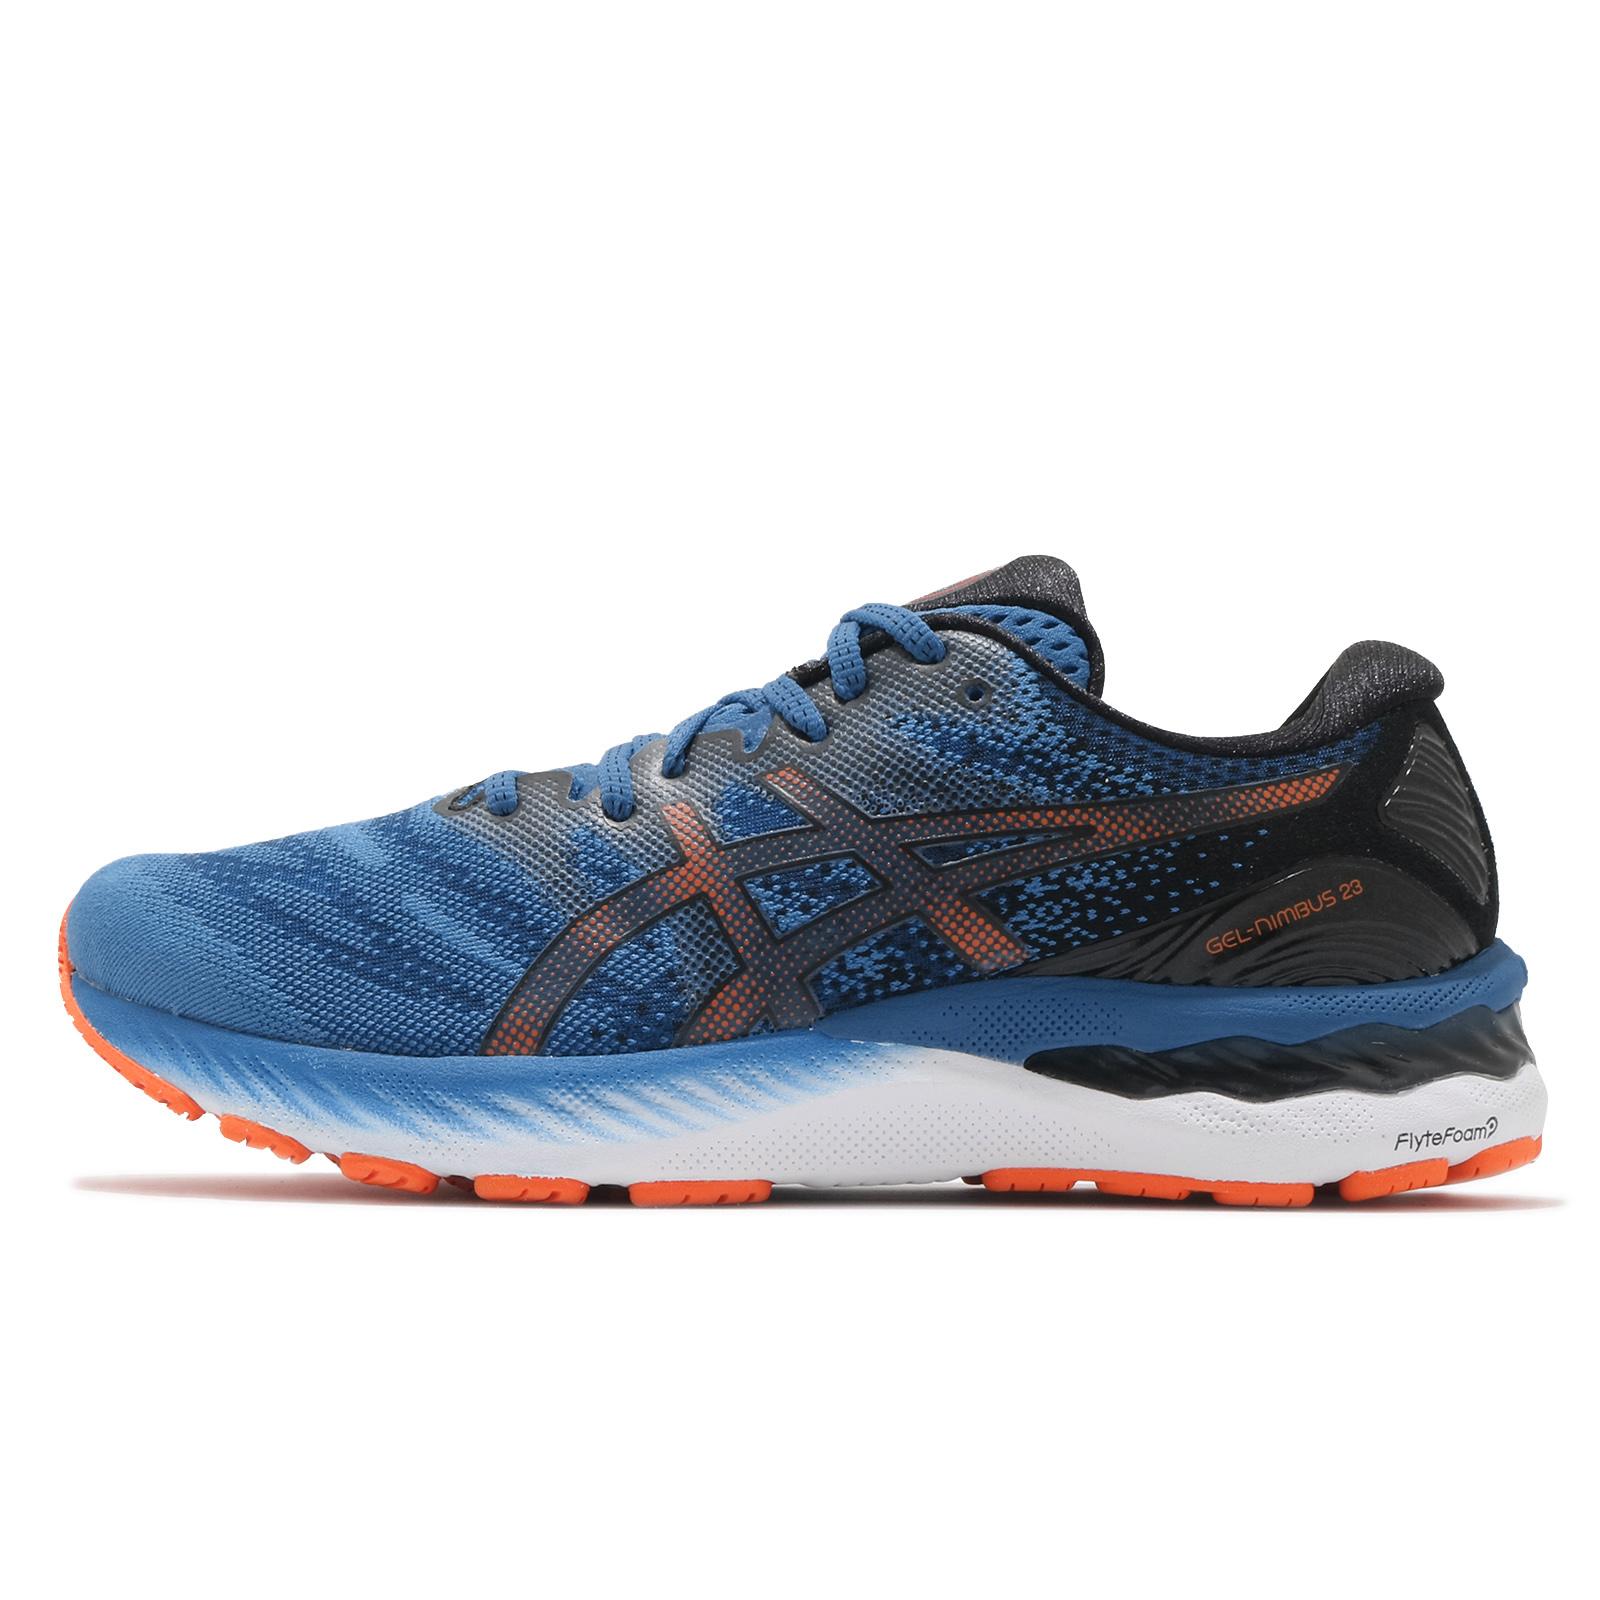 Asics 慢跑鞋 Gel-Nimbus 23 男 藍 橘 高緩衝 馬拉松 運動鞋【ACS】 1011B004-400